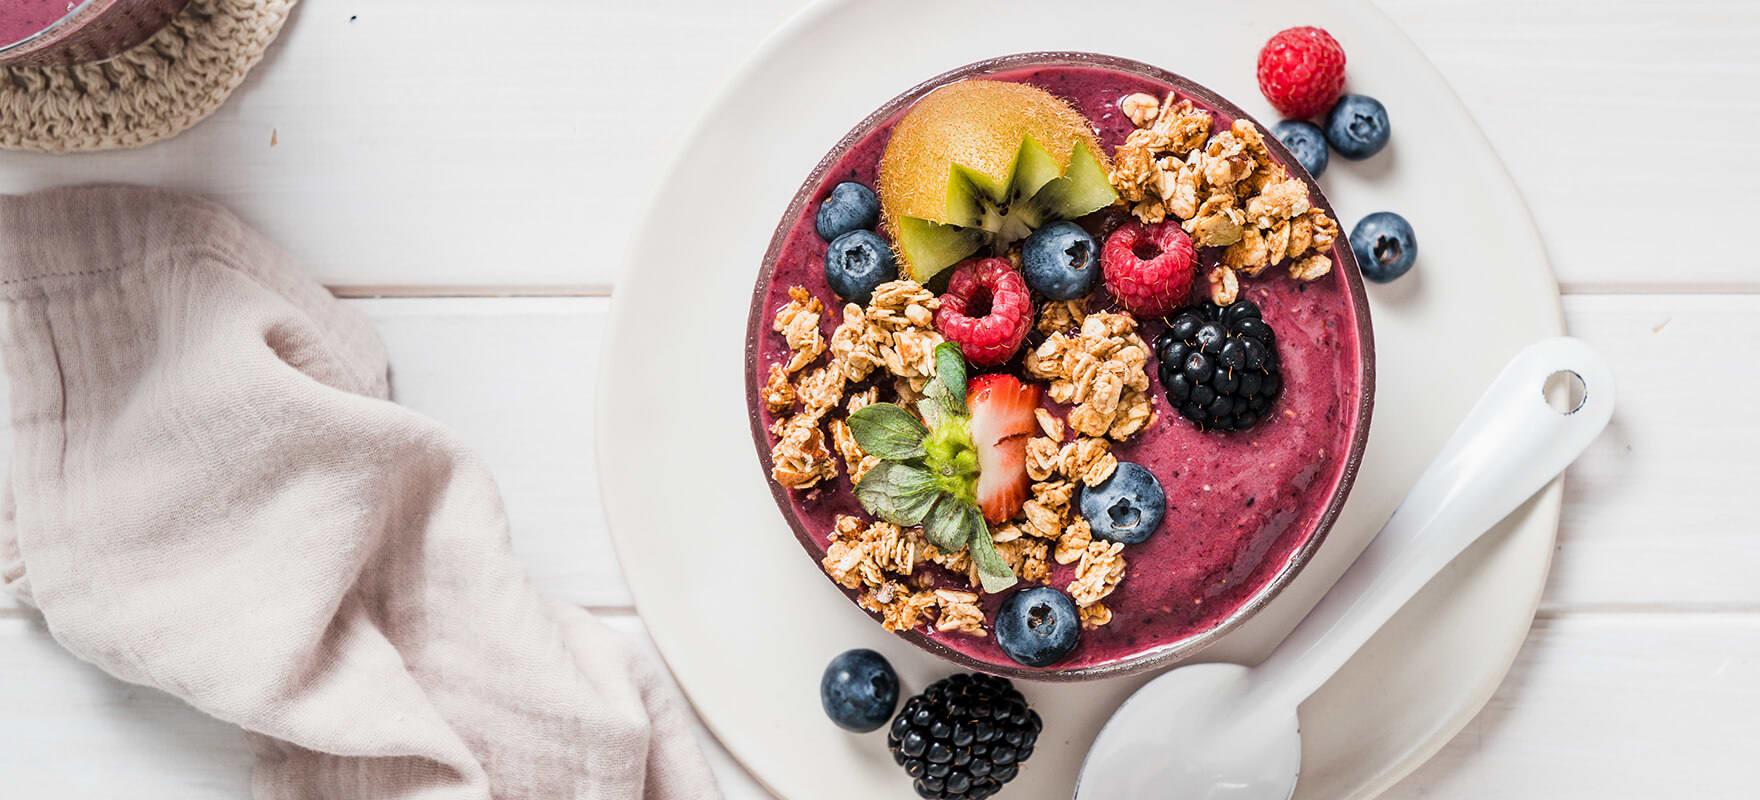 Mixed berry acai smoothie bowl image 2